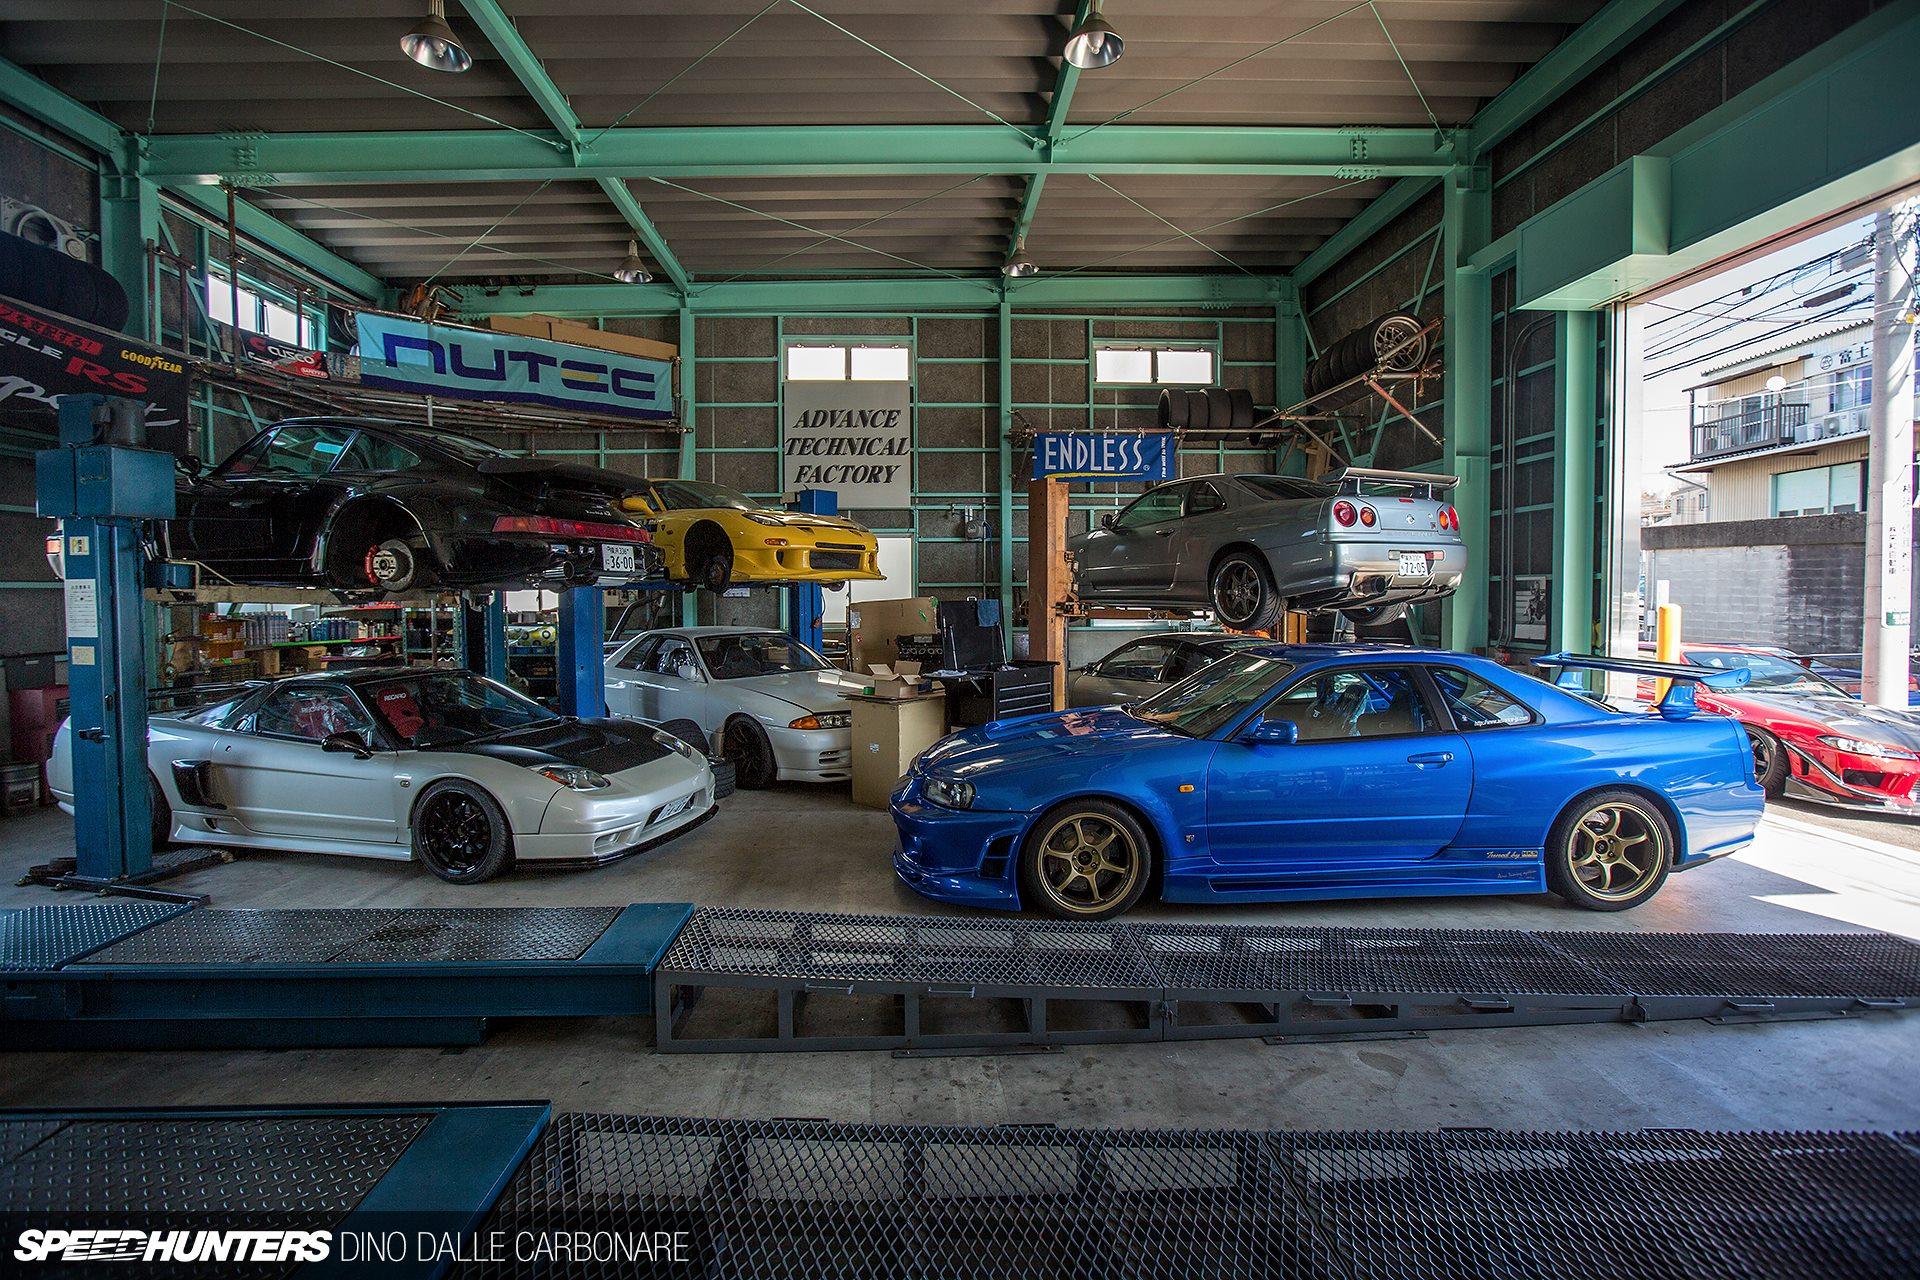 dream garage right there rh carthrottle com dream car garage.com honda dream garage commercial